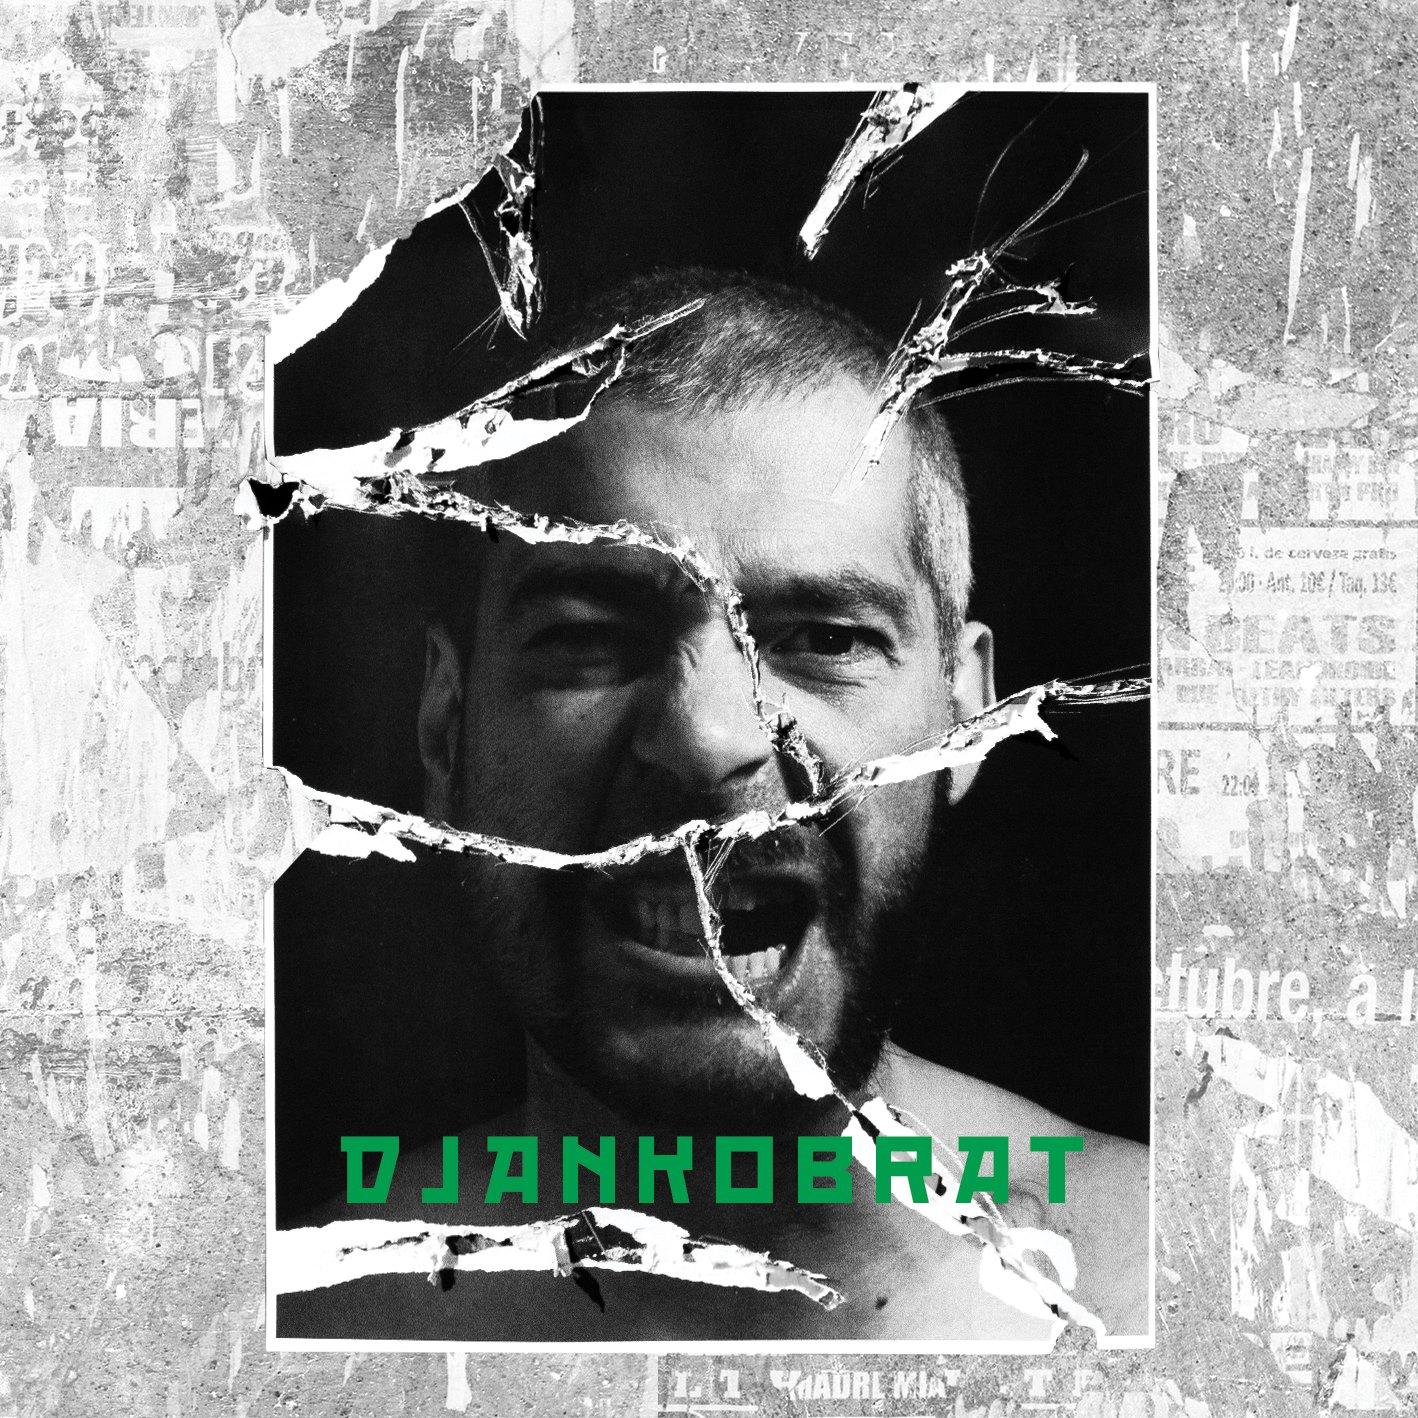 Djankobrat - Djankobrat (Album 2019)